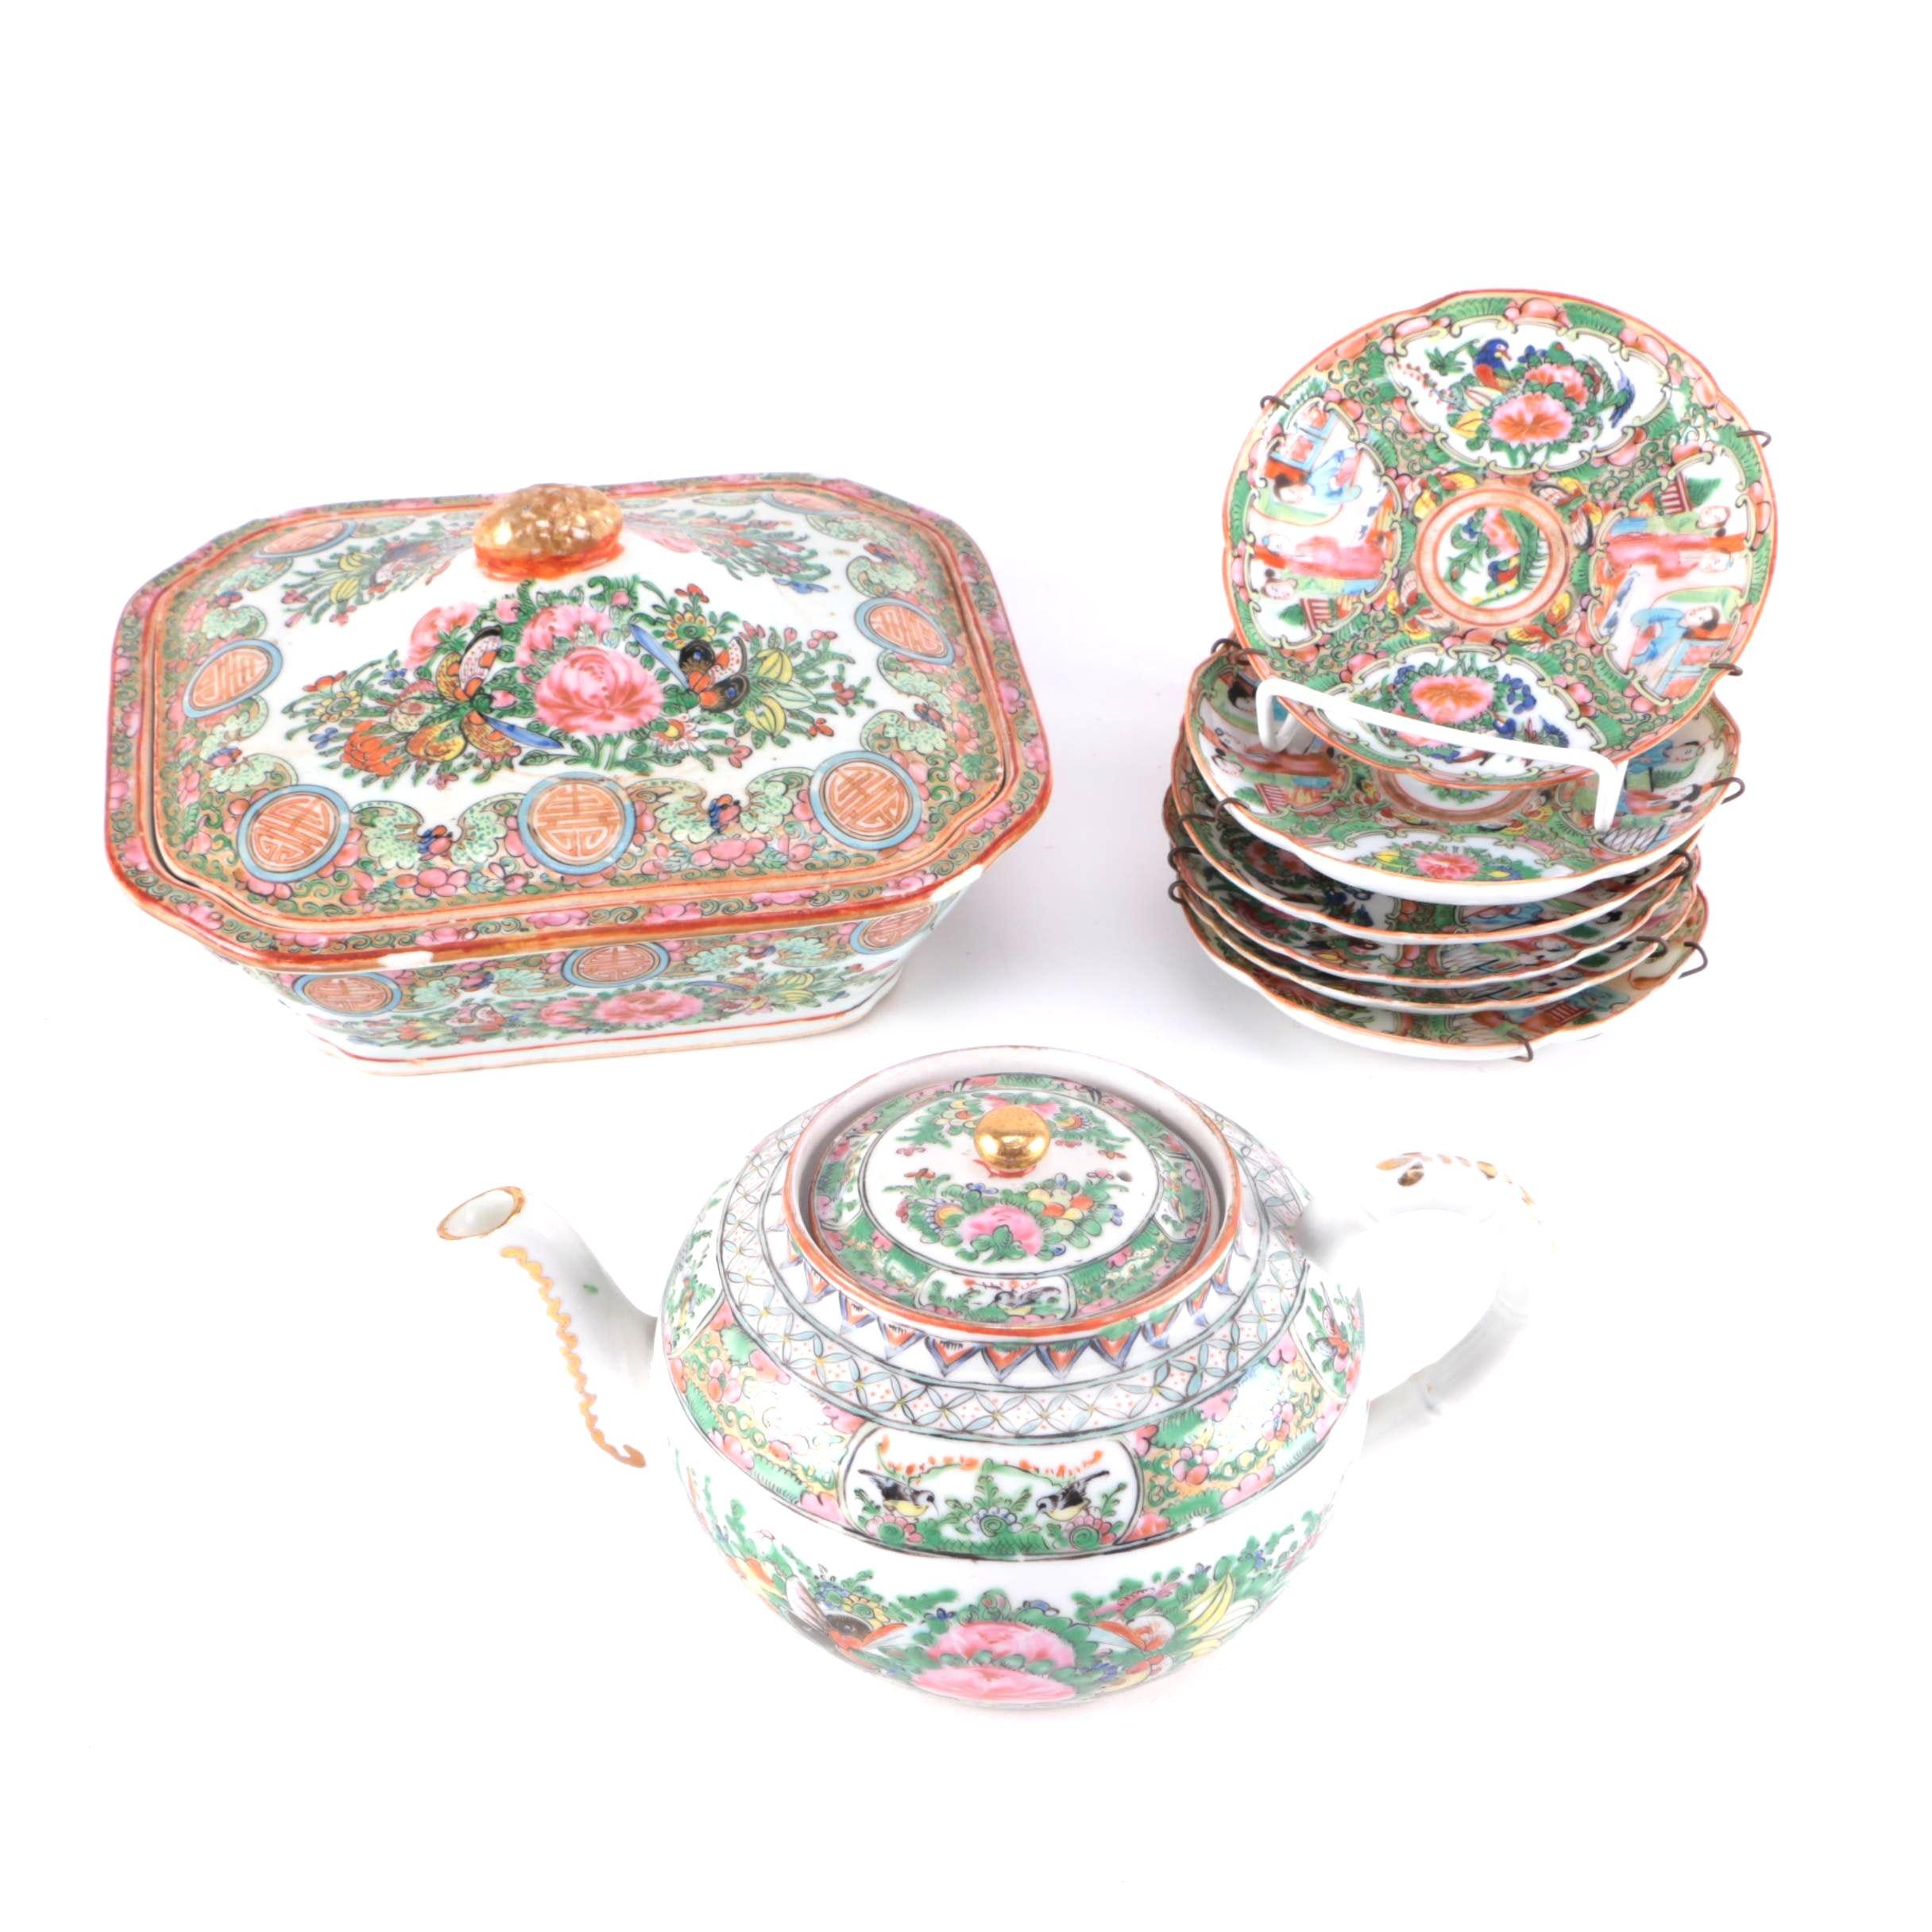 Chinese Rose Medallion Porcelain Tableware